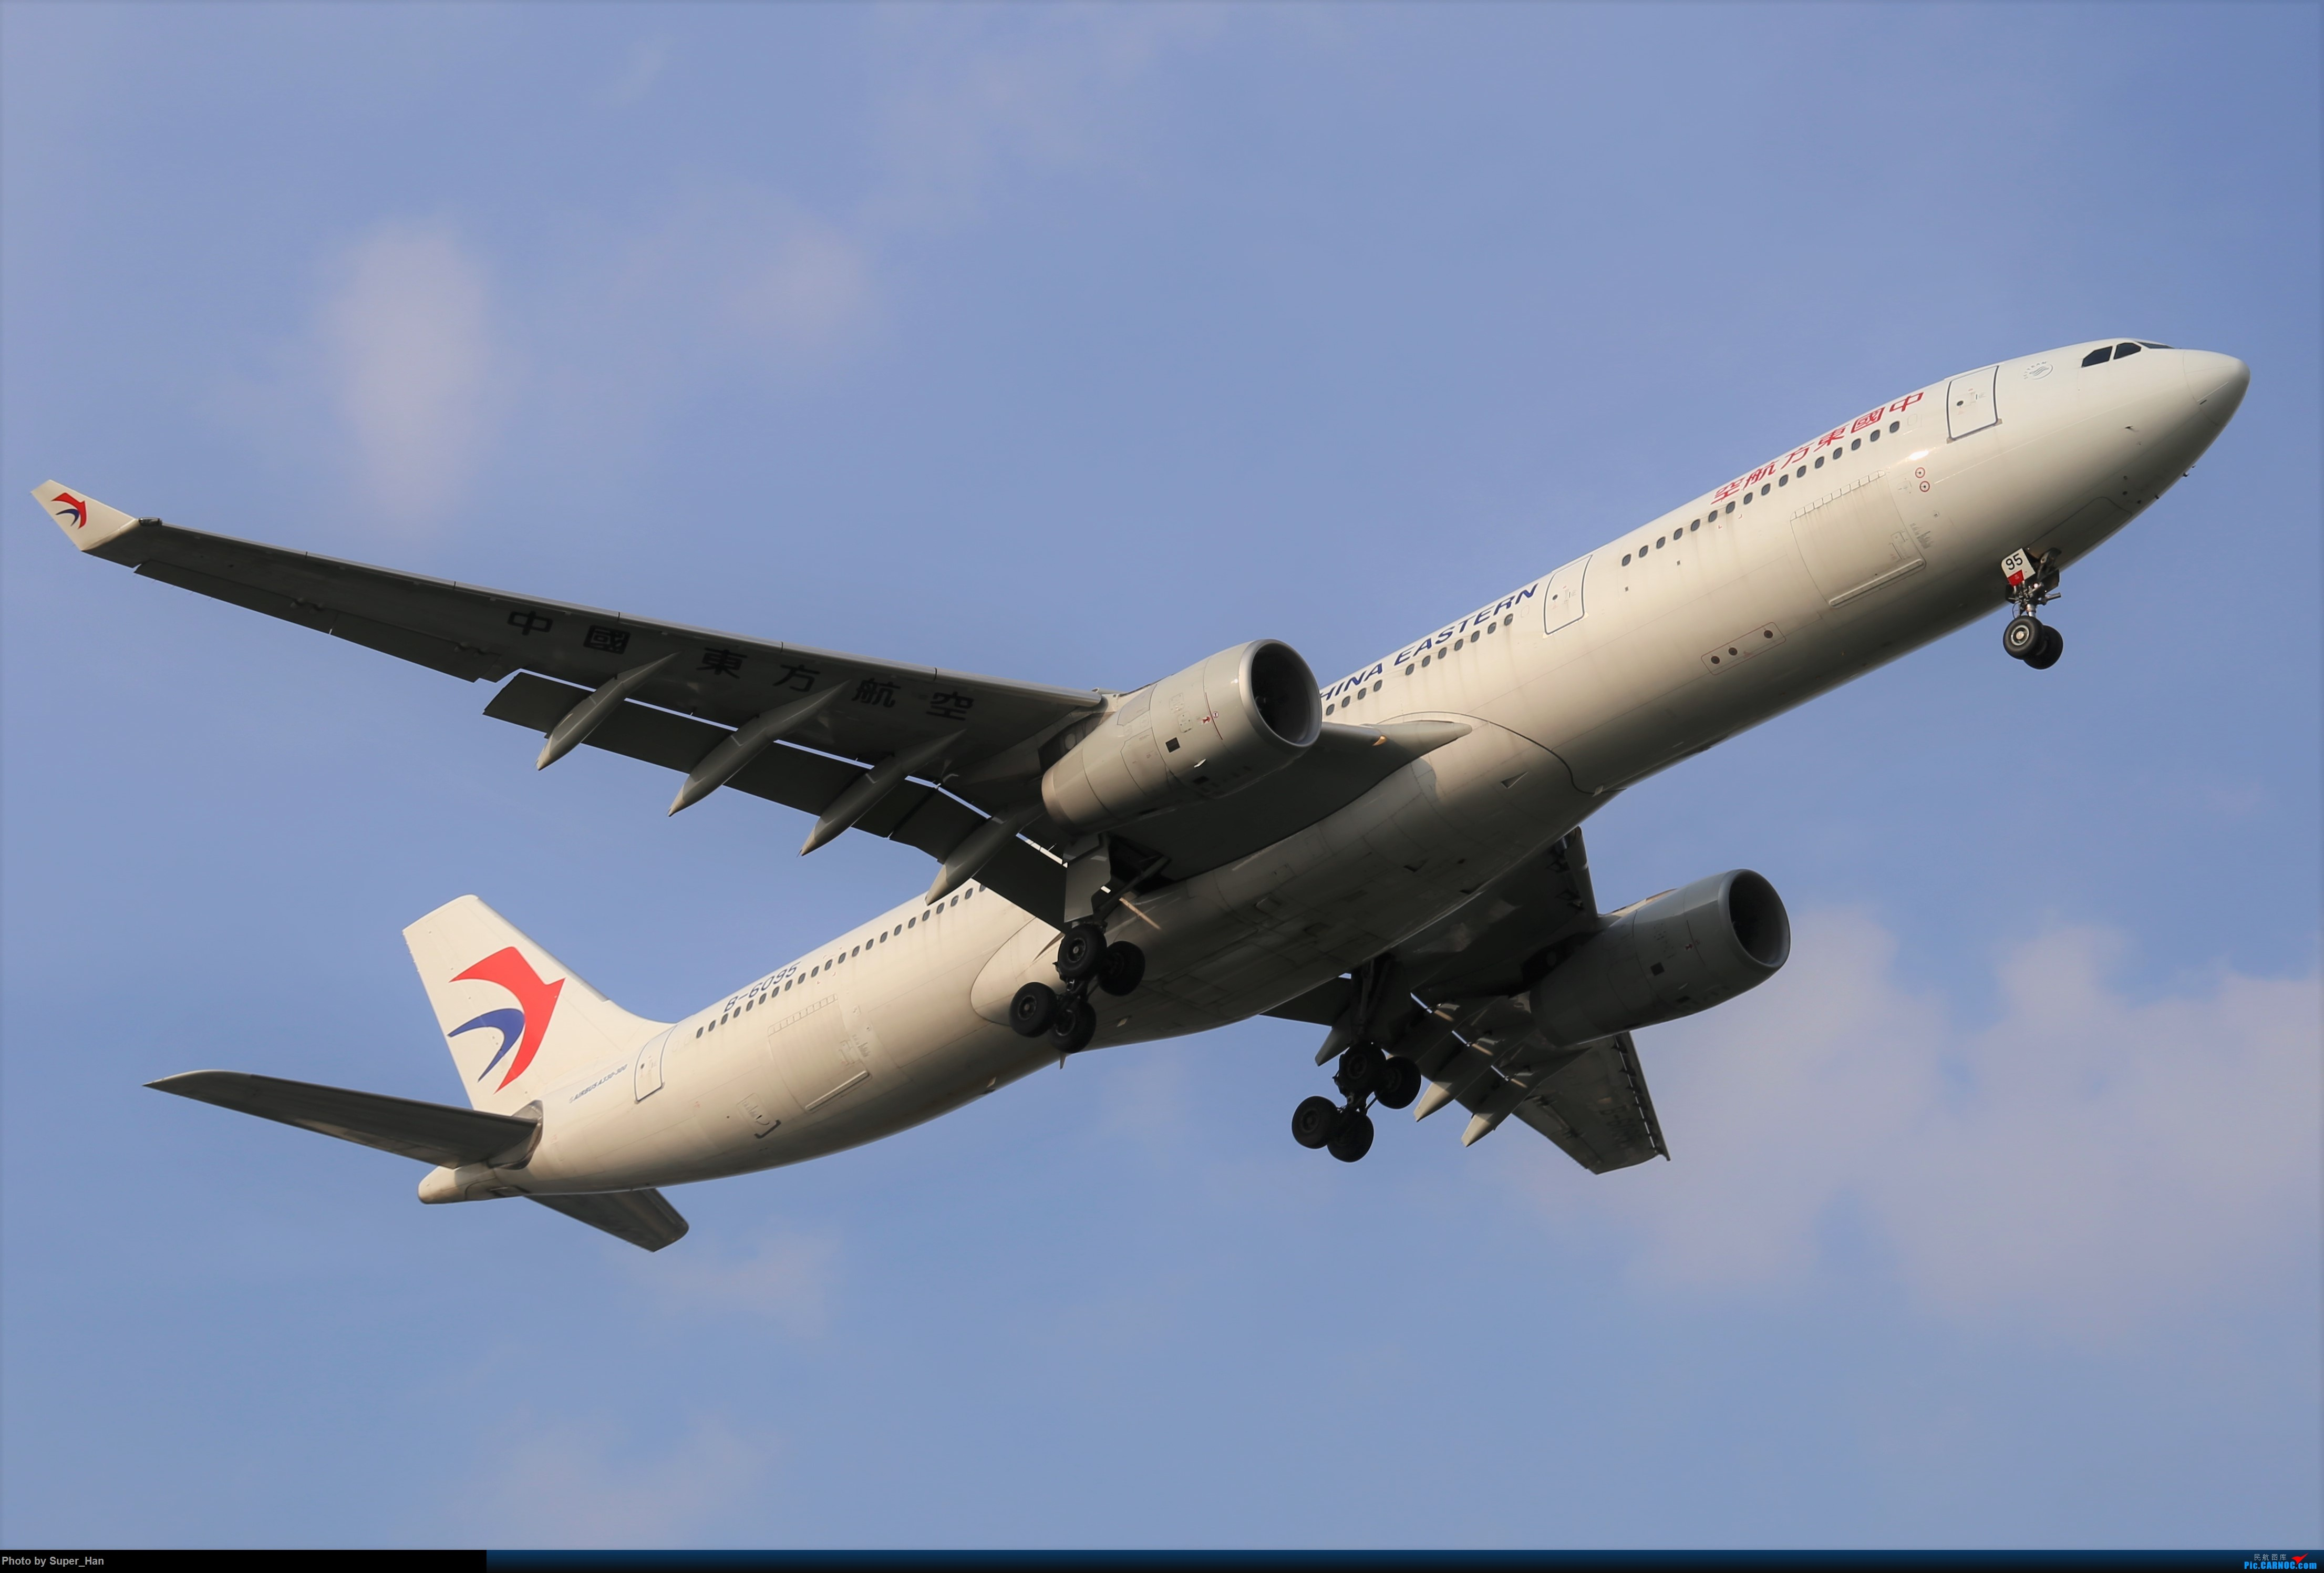 Re:[原创]0715去虹桥说走就走【最多的330篇】 AIRBUS A330-300 B-6095 中国上海虹桥国际机场